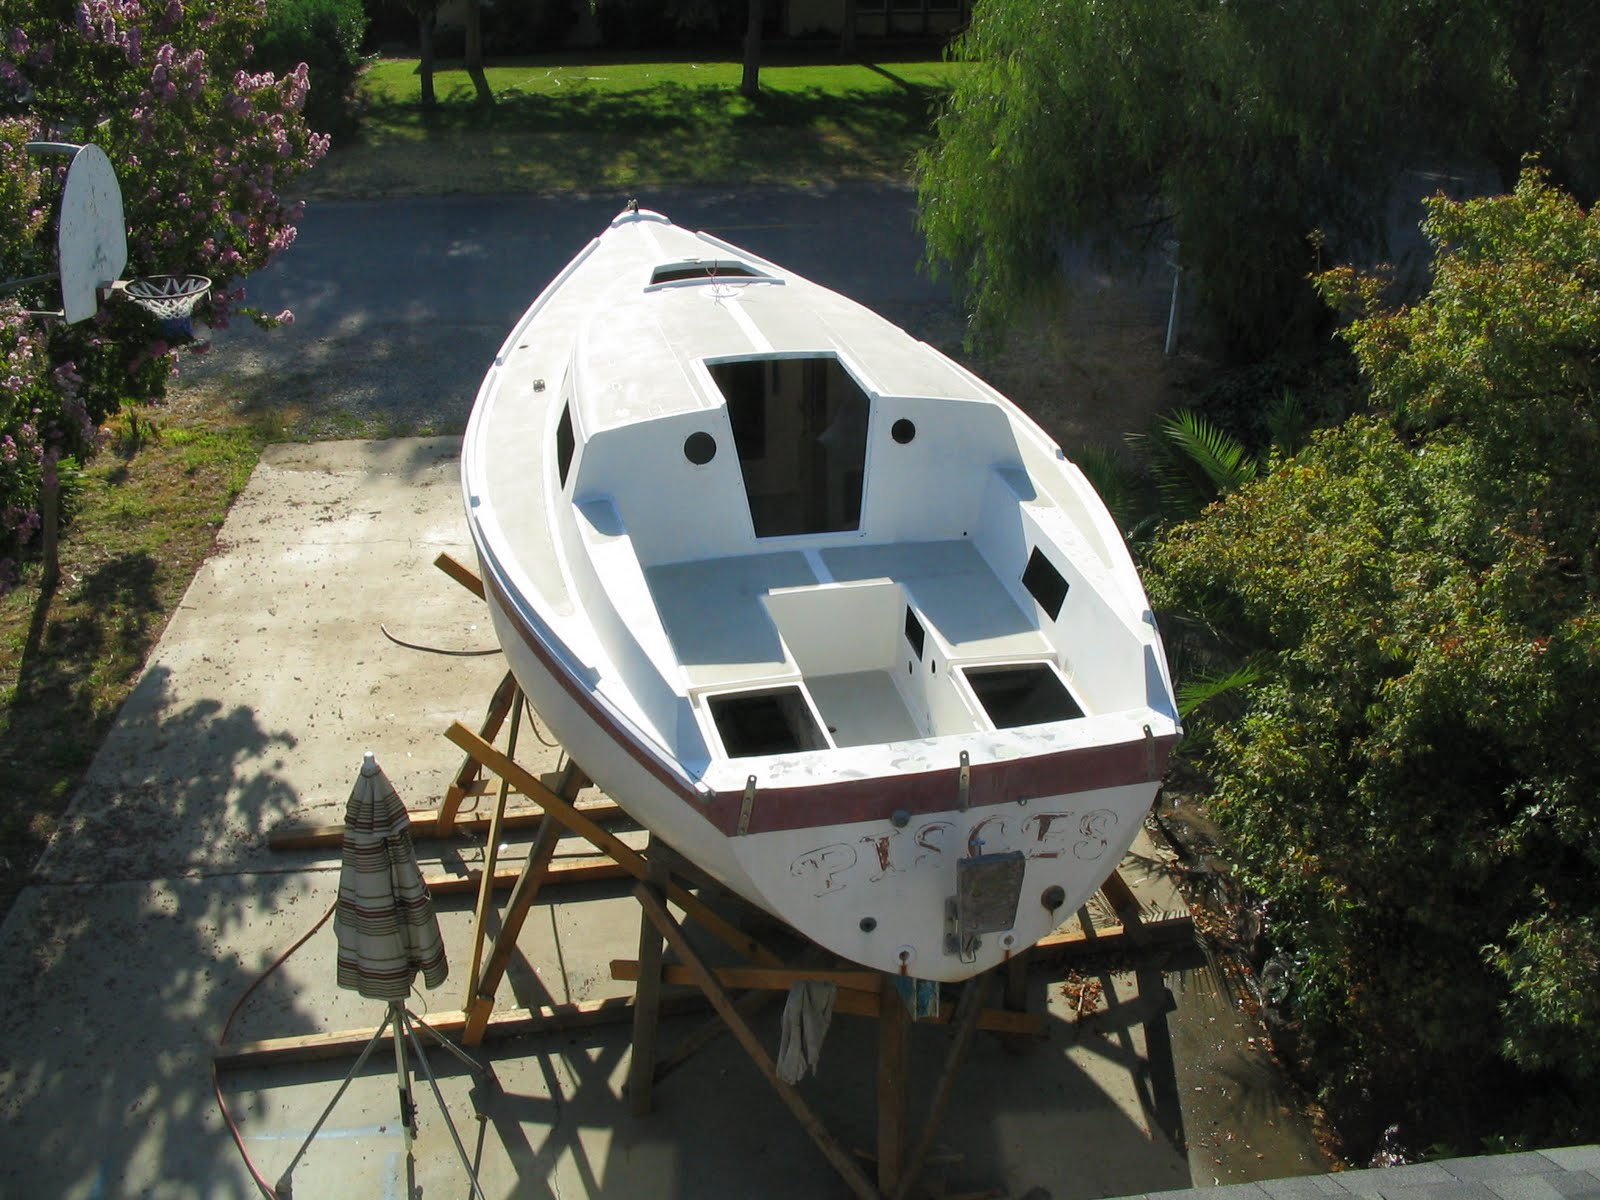 http://3.bp.blogspot.com/_LEsPsjFnqkQ/TGjJEarPYrI/AAAAAAAAAD4/3F5tT_Vpnag/s1600/boat%2Bconstruction%2B3%2B040.jpg